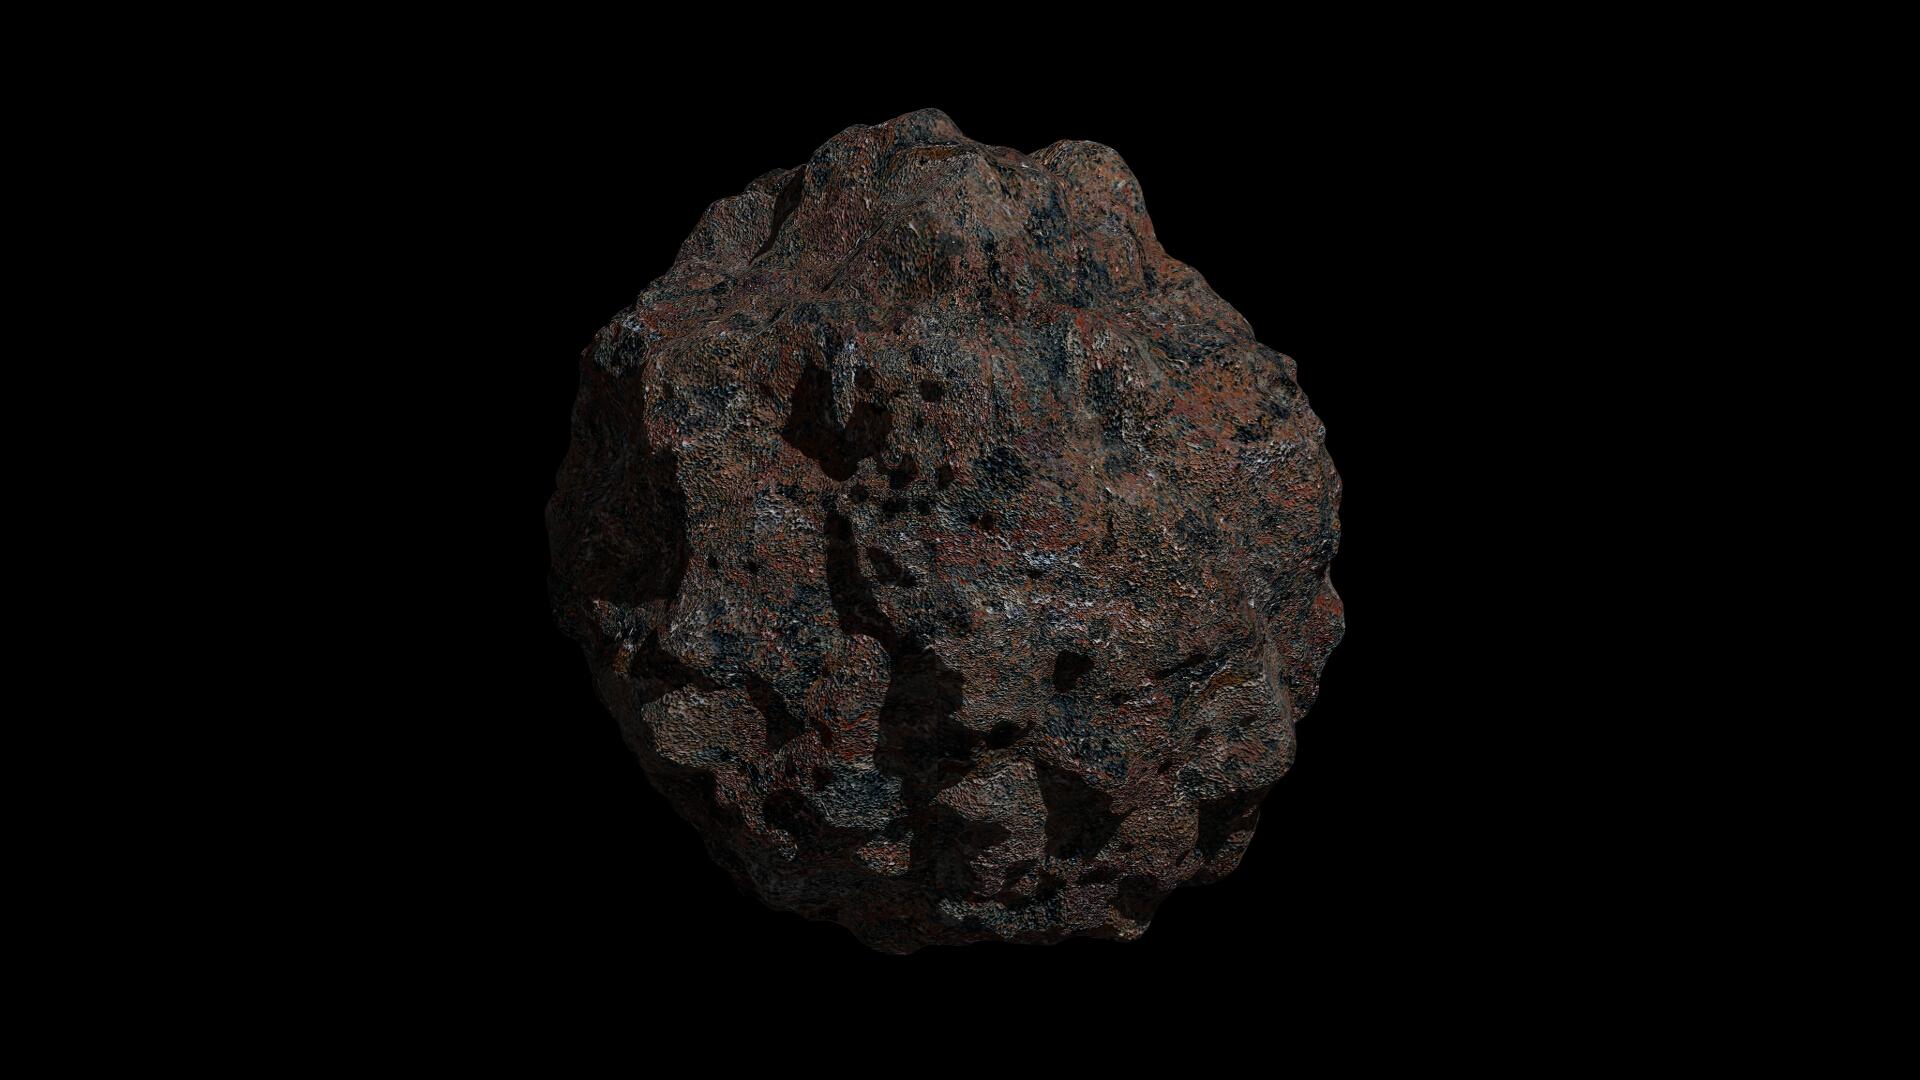 fantasy asteroid 3 3d model 3ds fbx dae obj 267324